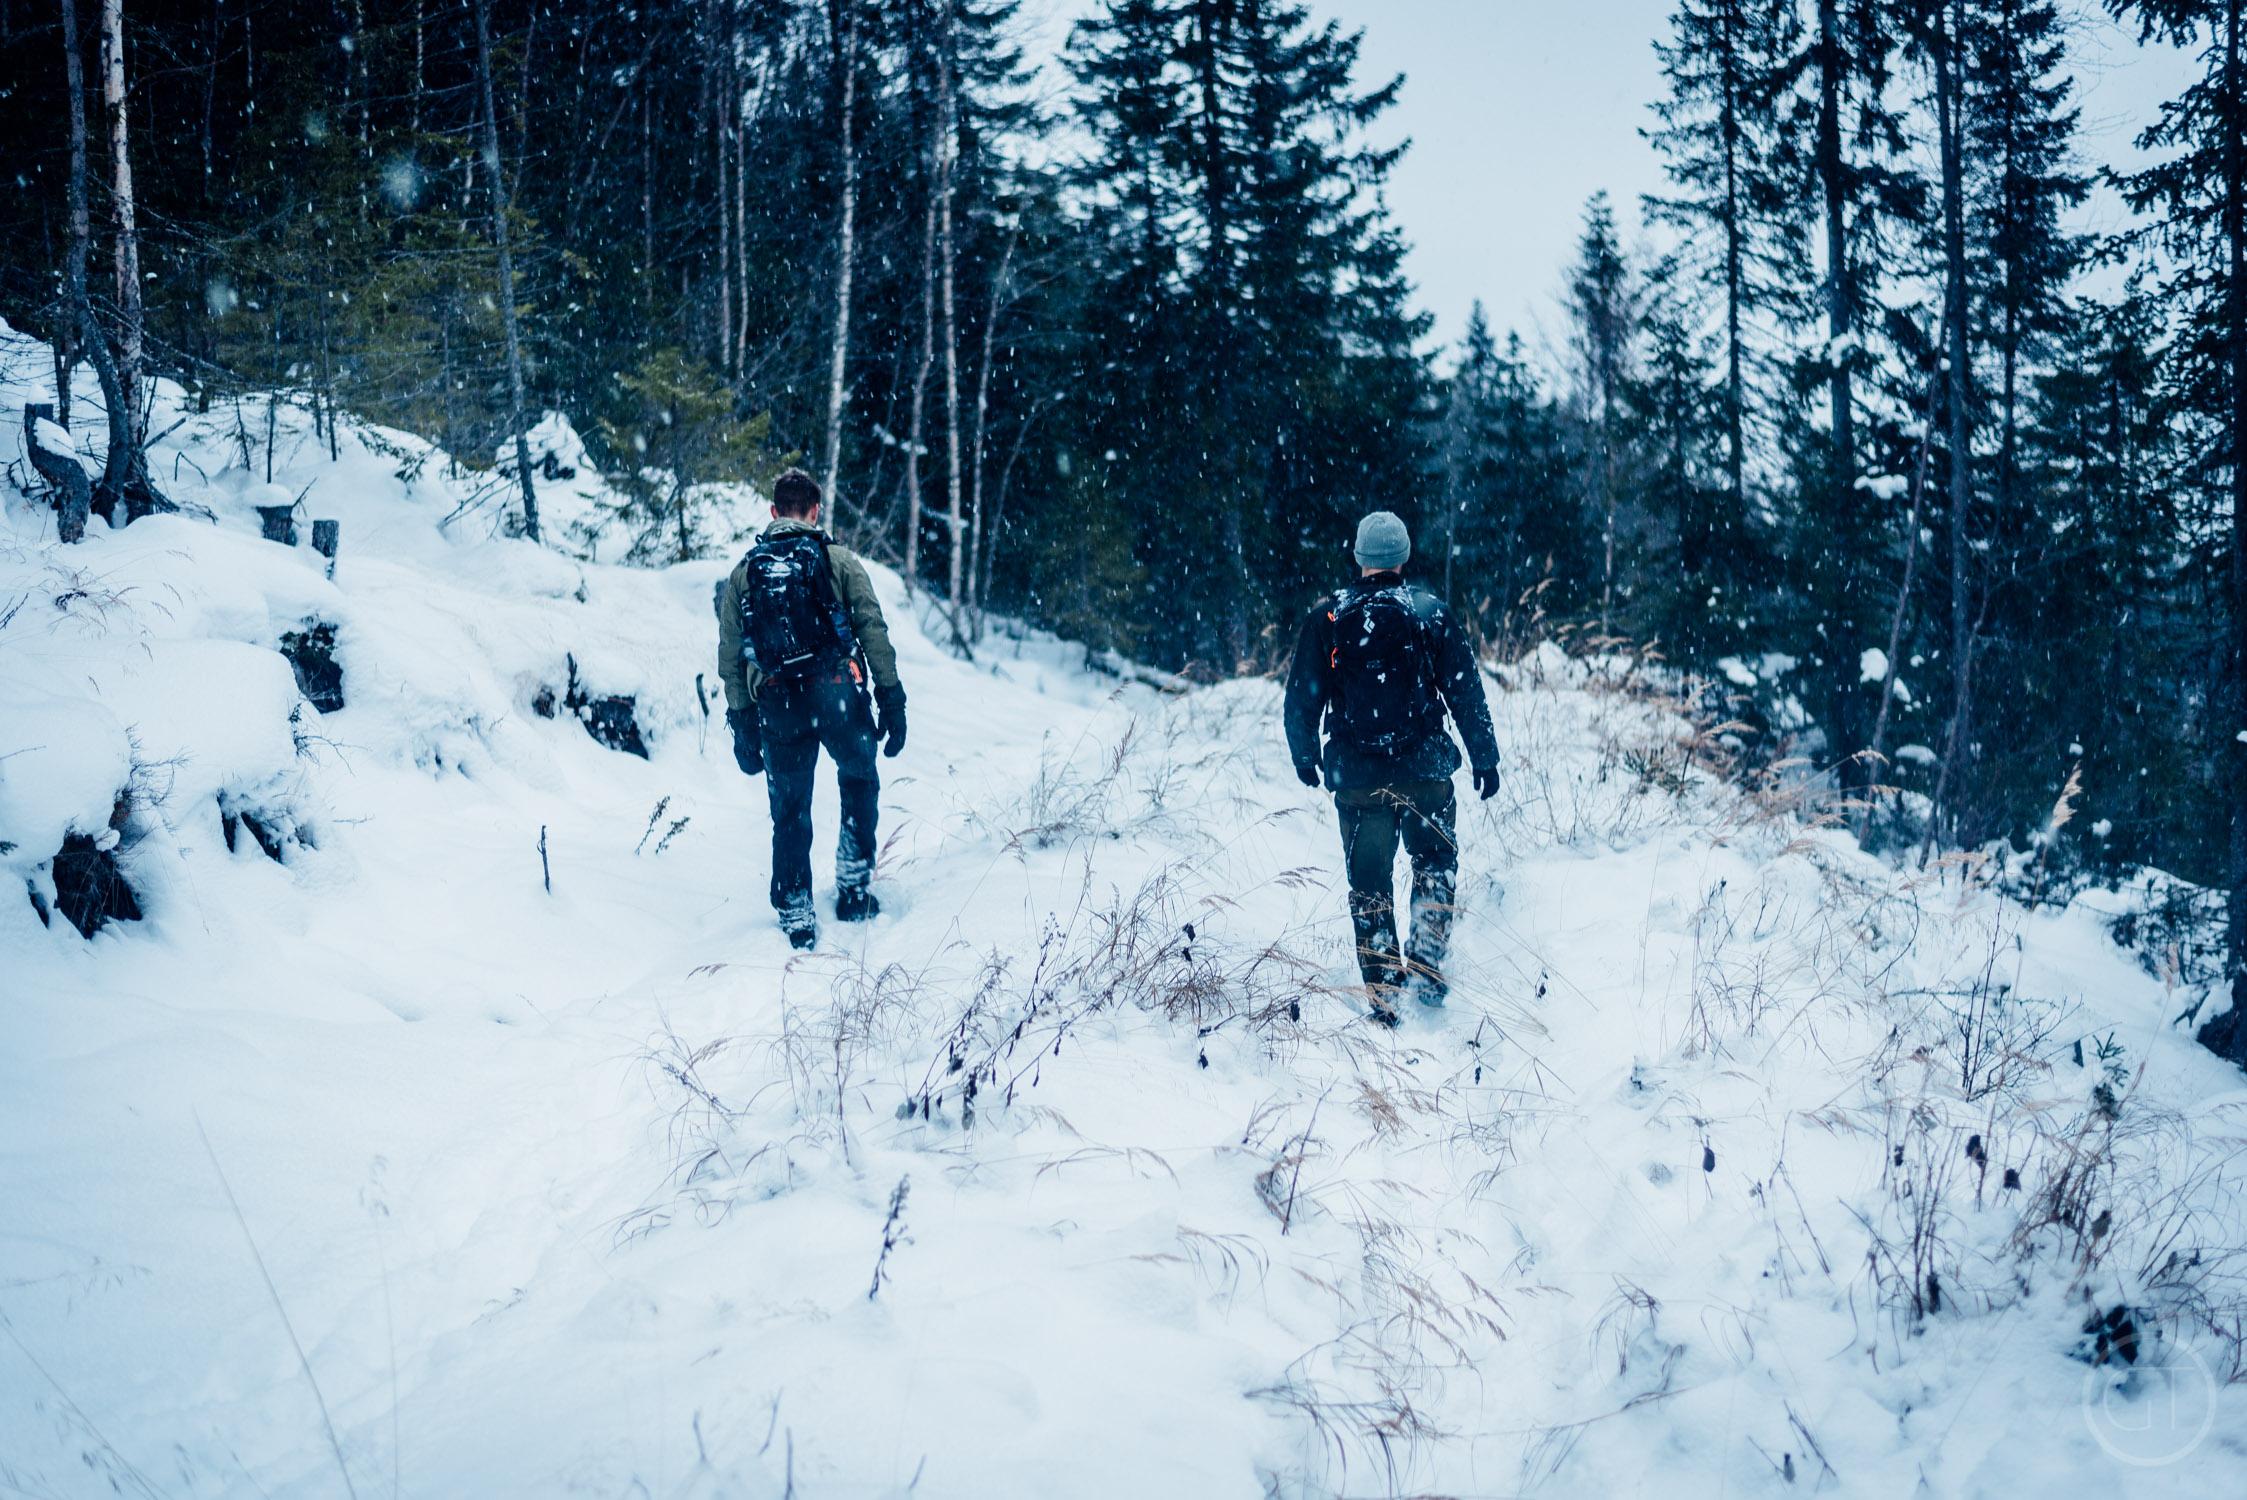 GUSTAV_THUESEN_HUNTING_NORWAY_OUTDOOR_LIFESTYLE_PHOTOGRAPHER_PROFESSIONAL-31.jpg